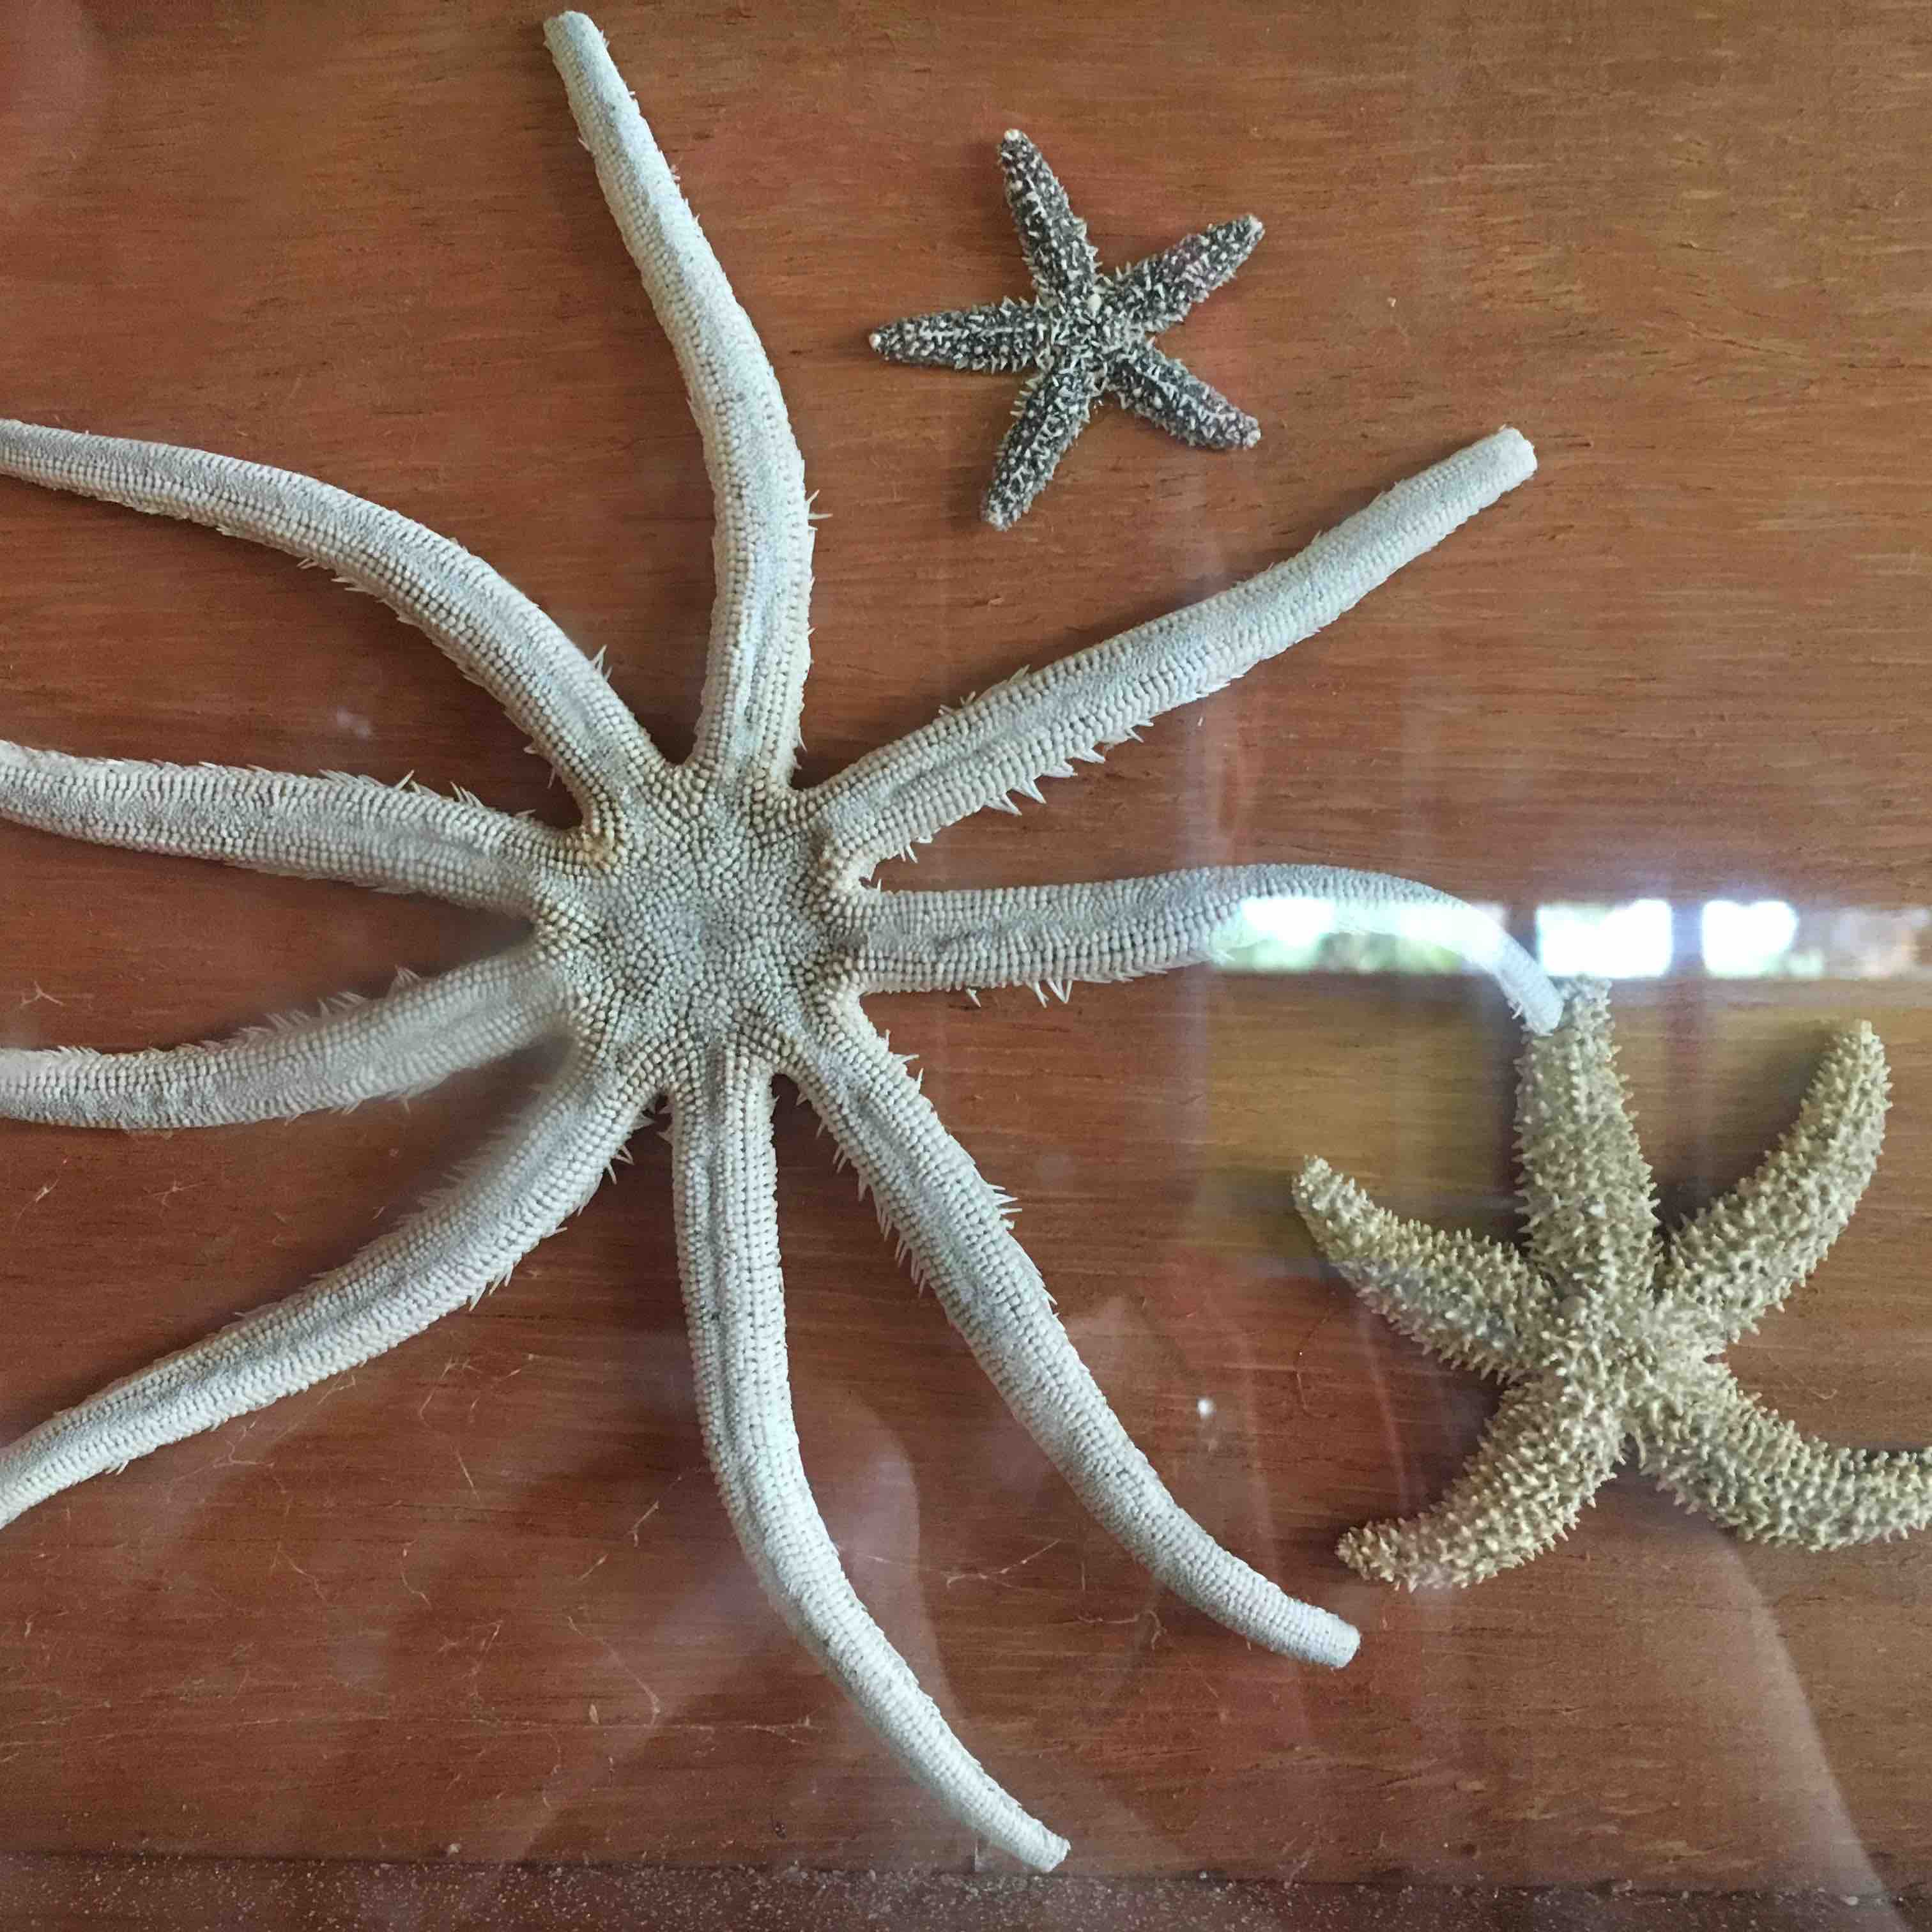 Florida starfish nine-legged, five-legged